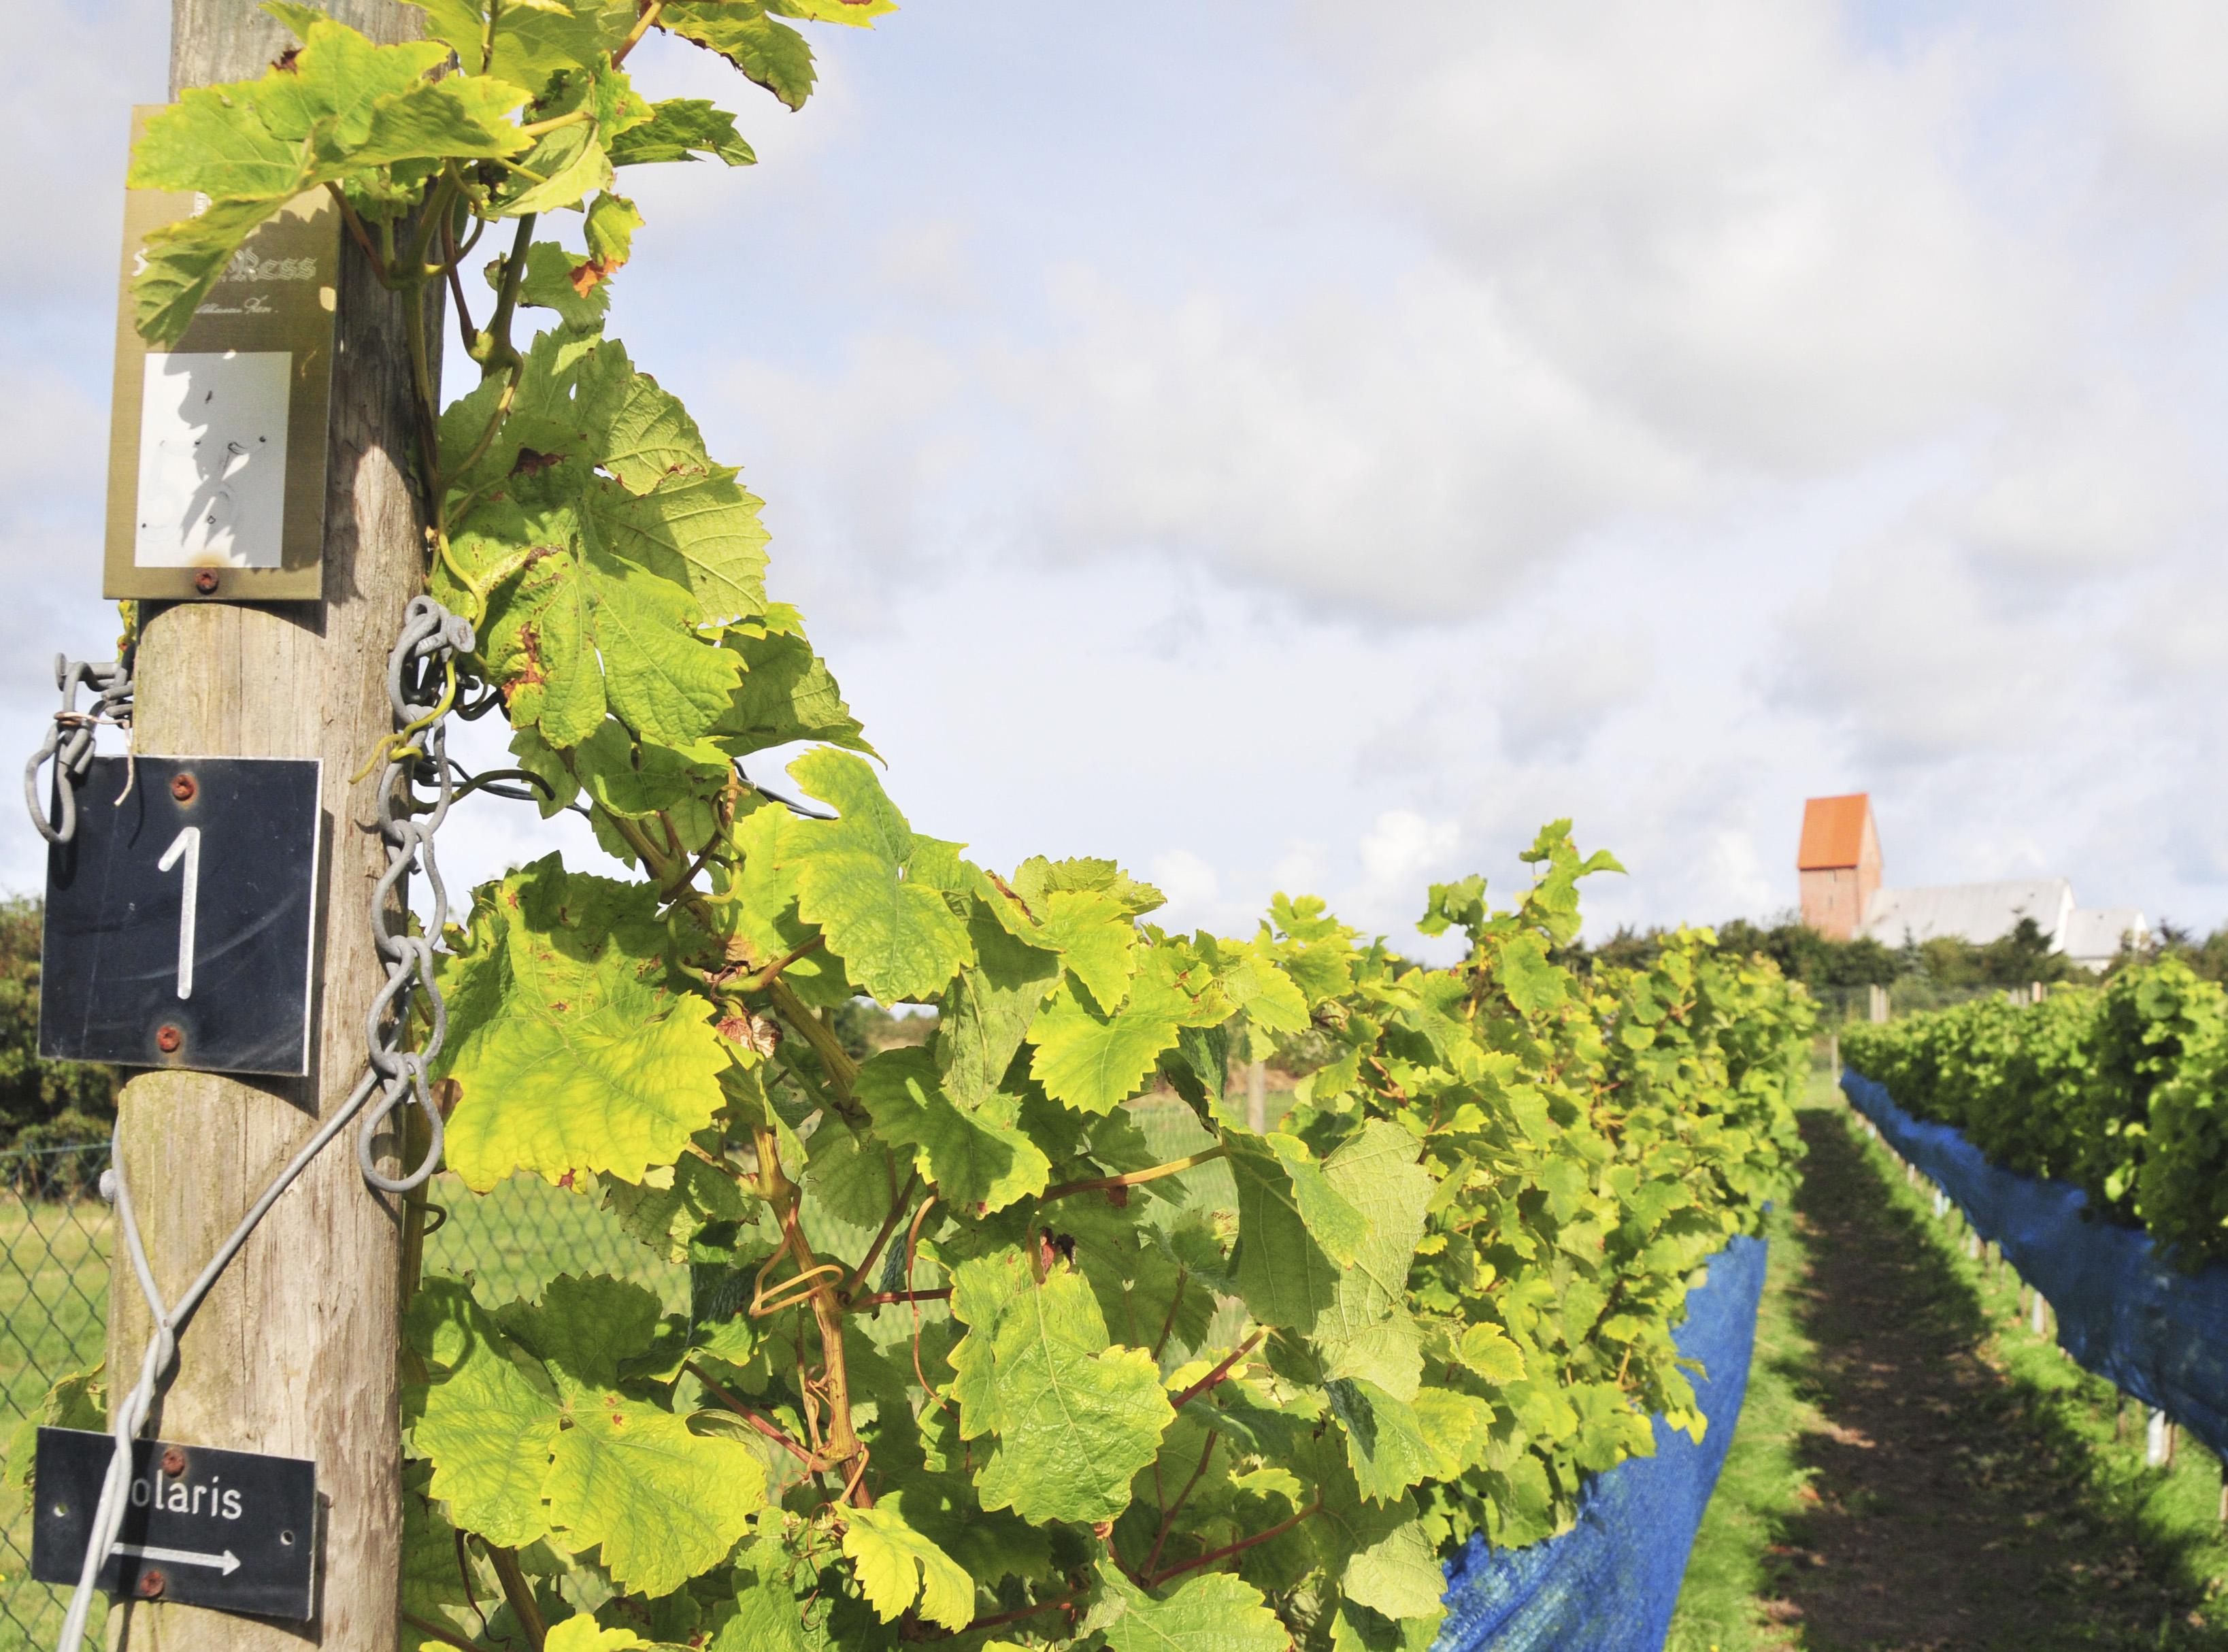 Nils Lackner's vineyards